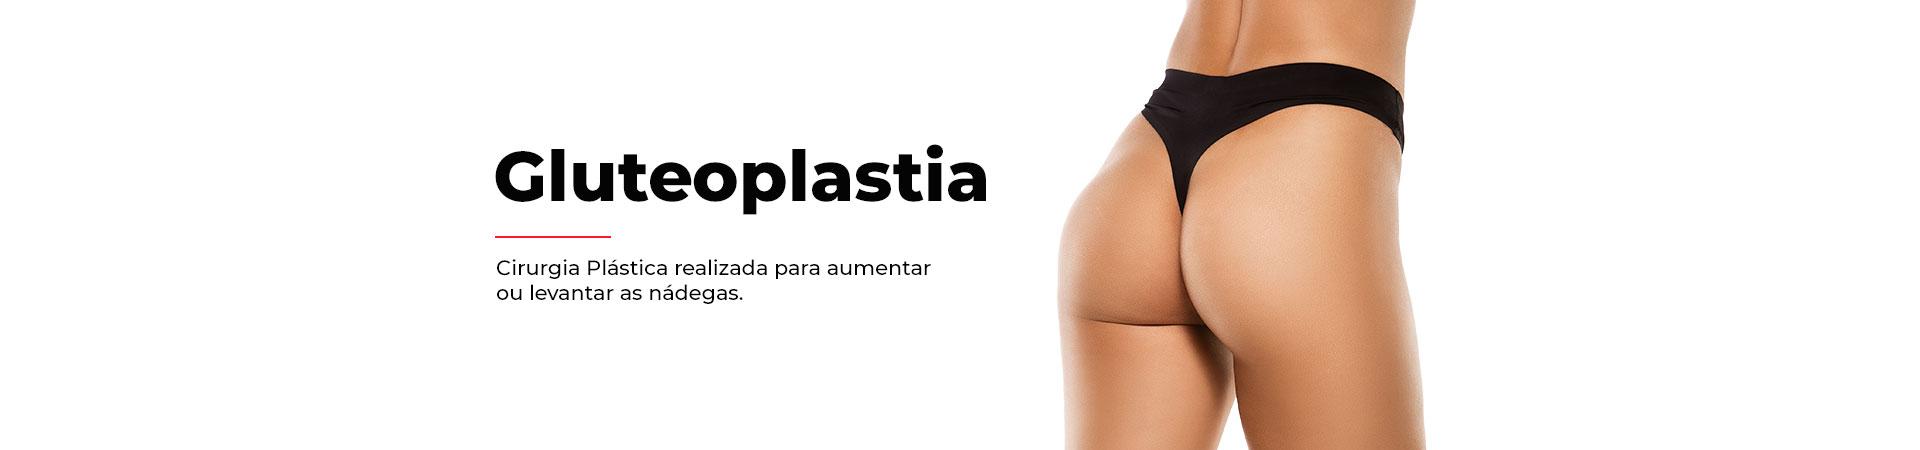 Gluteoplastia-2